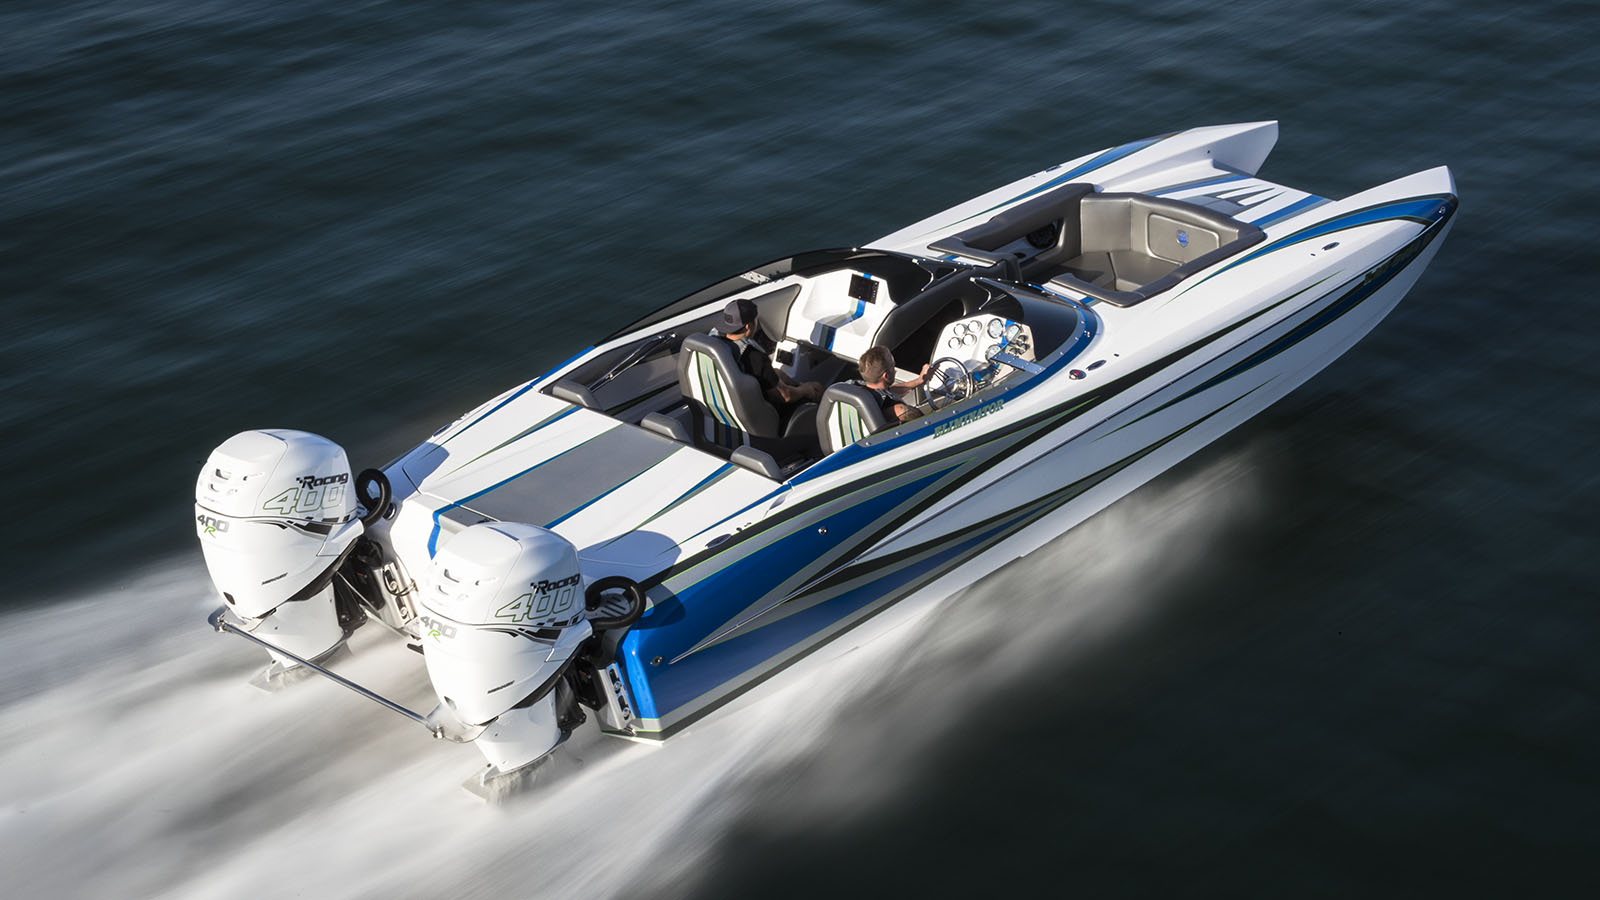 28 Speedster Outboard twin 400s #7.jpg